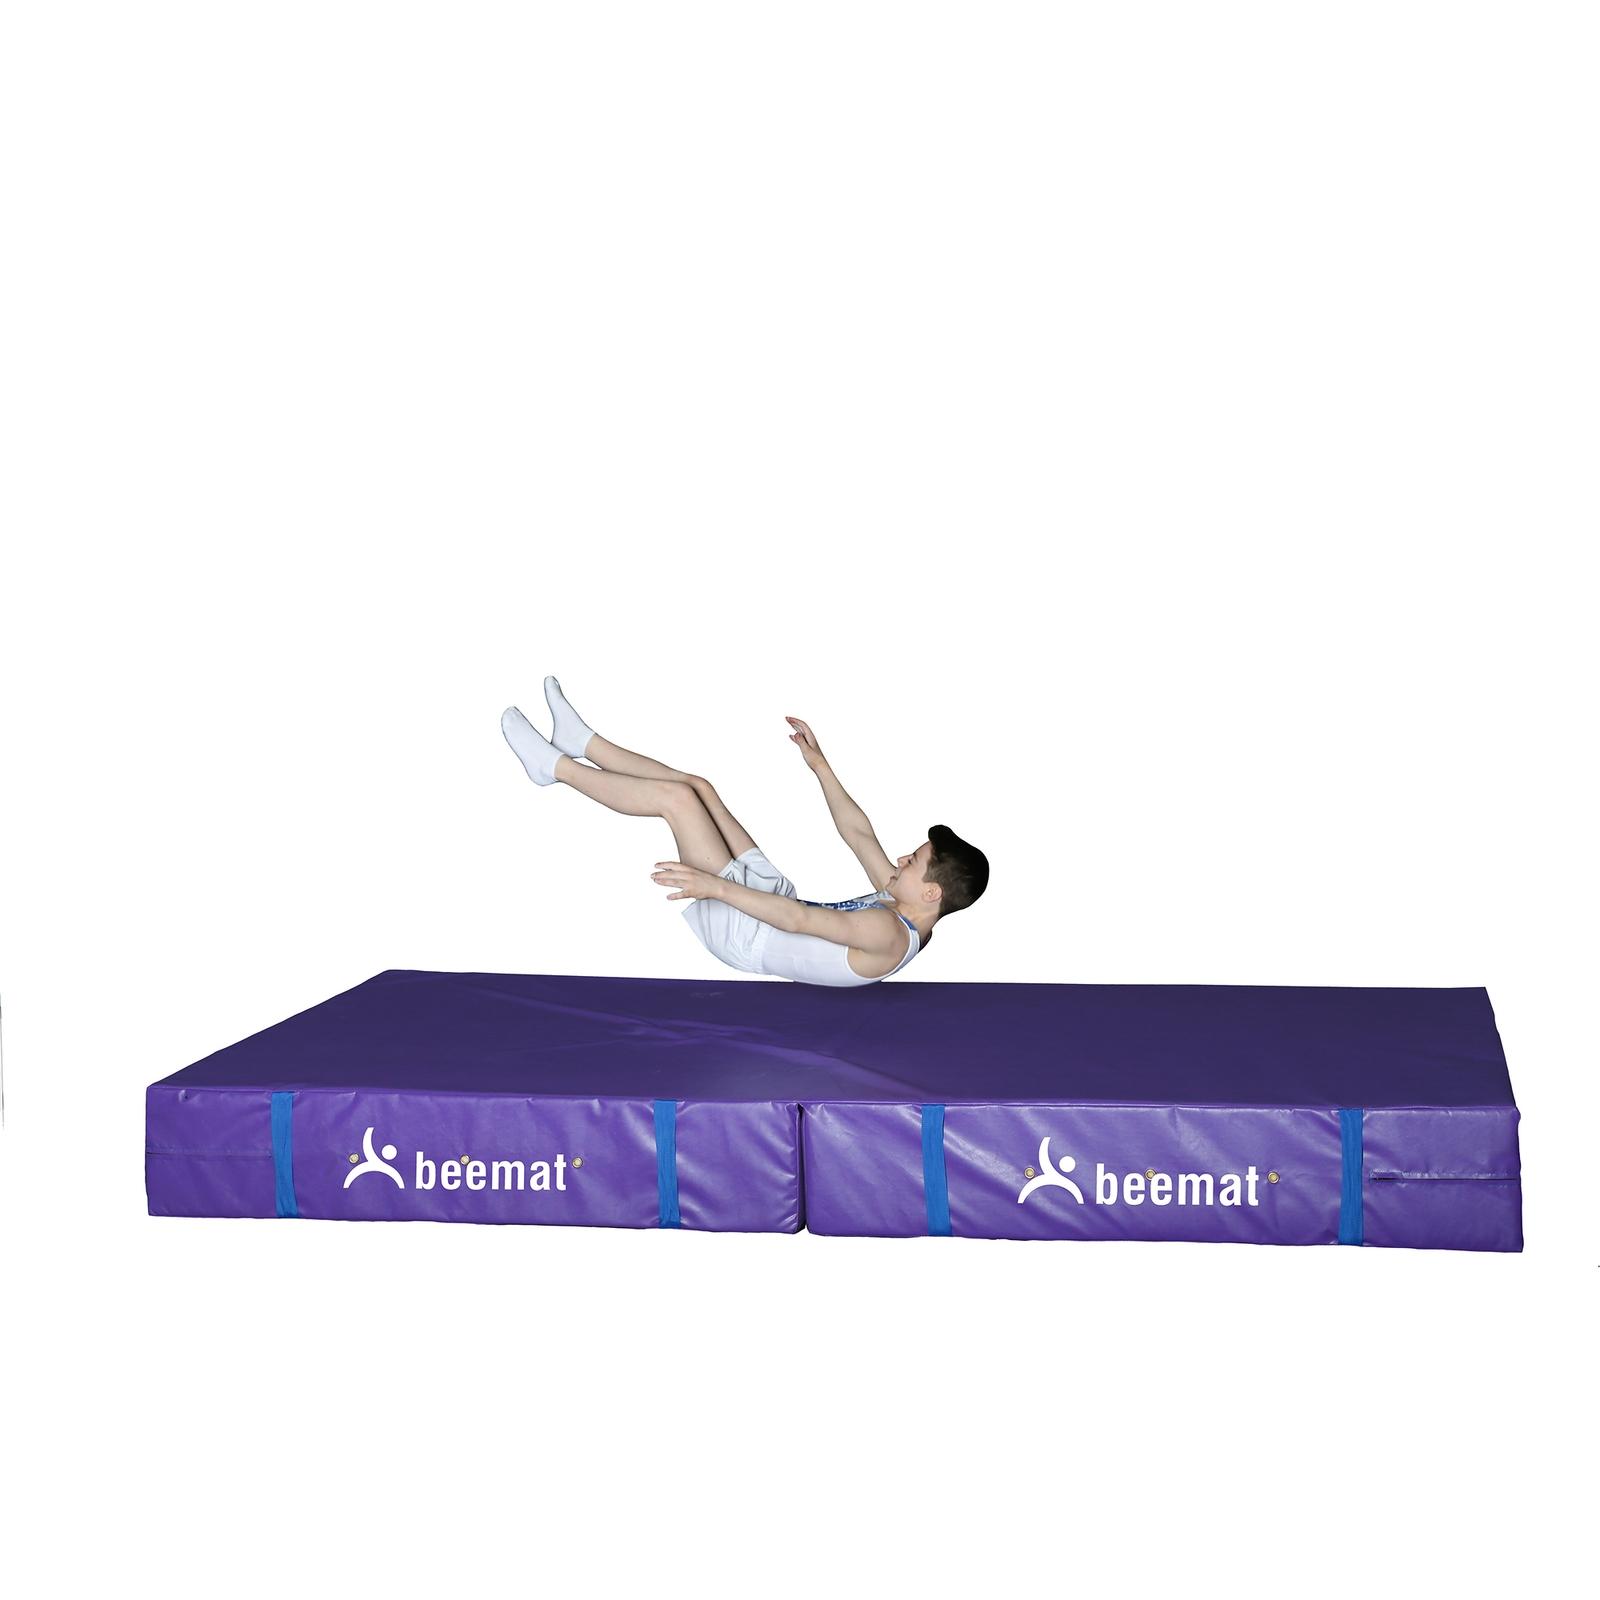 Beemat Folding Crashmat - 2.44x1.22mx200mm